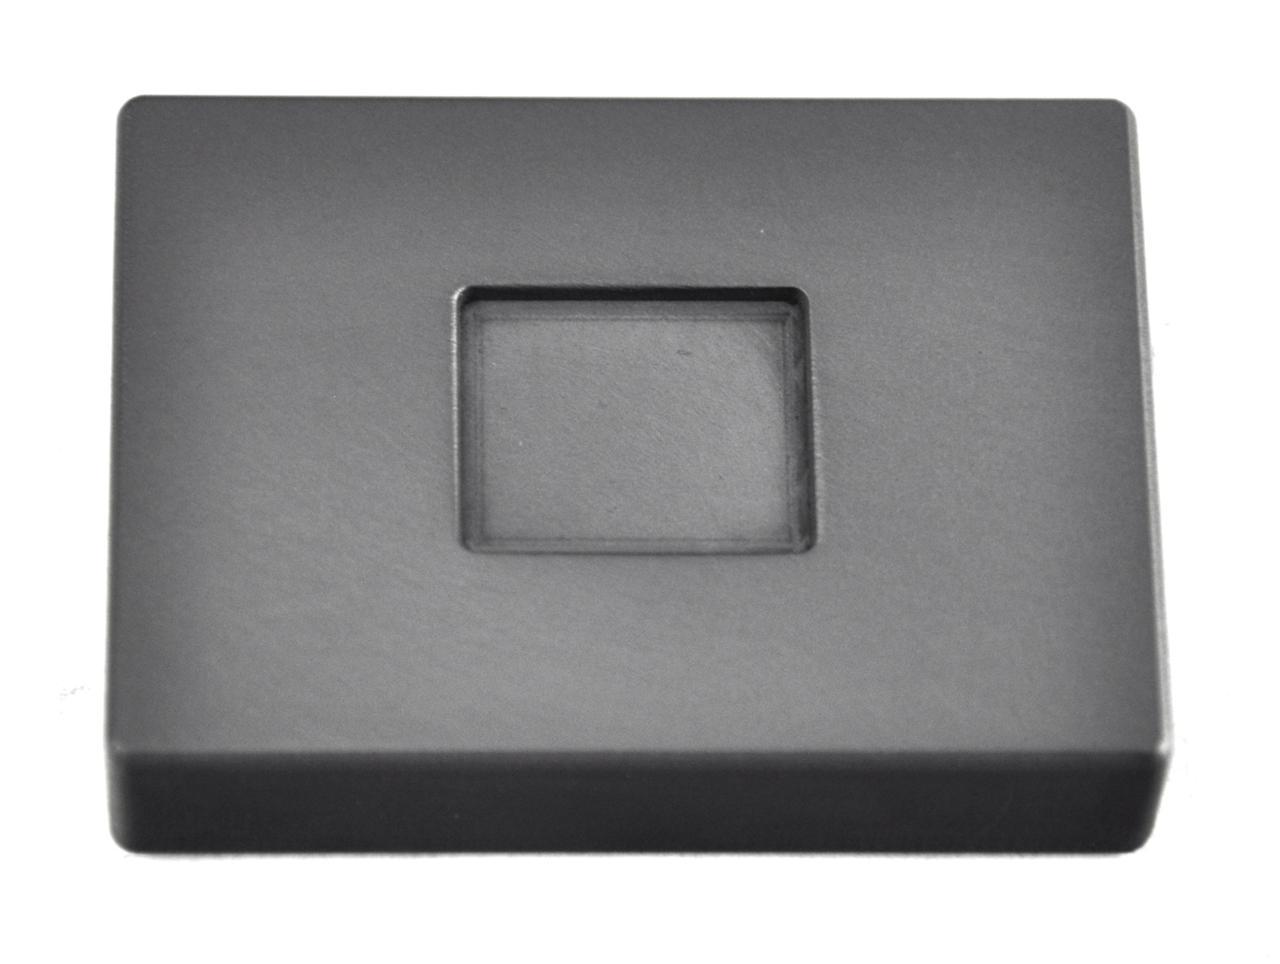 1 4 Troy Ounce Silver Rectangular Graphite Ingot Mold